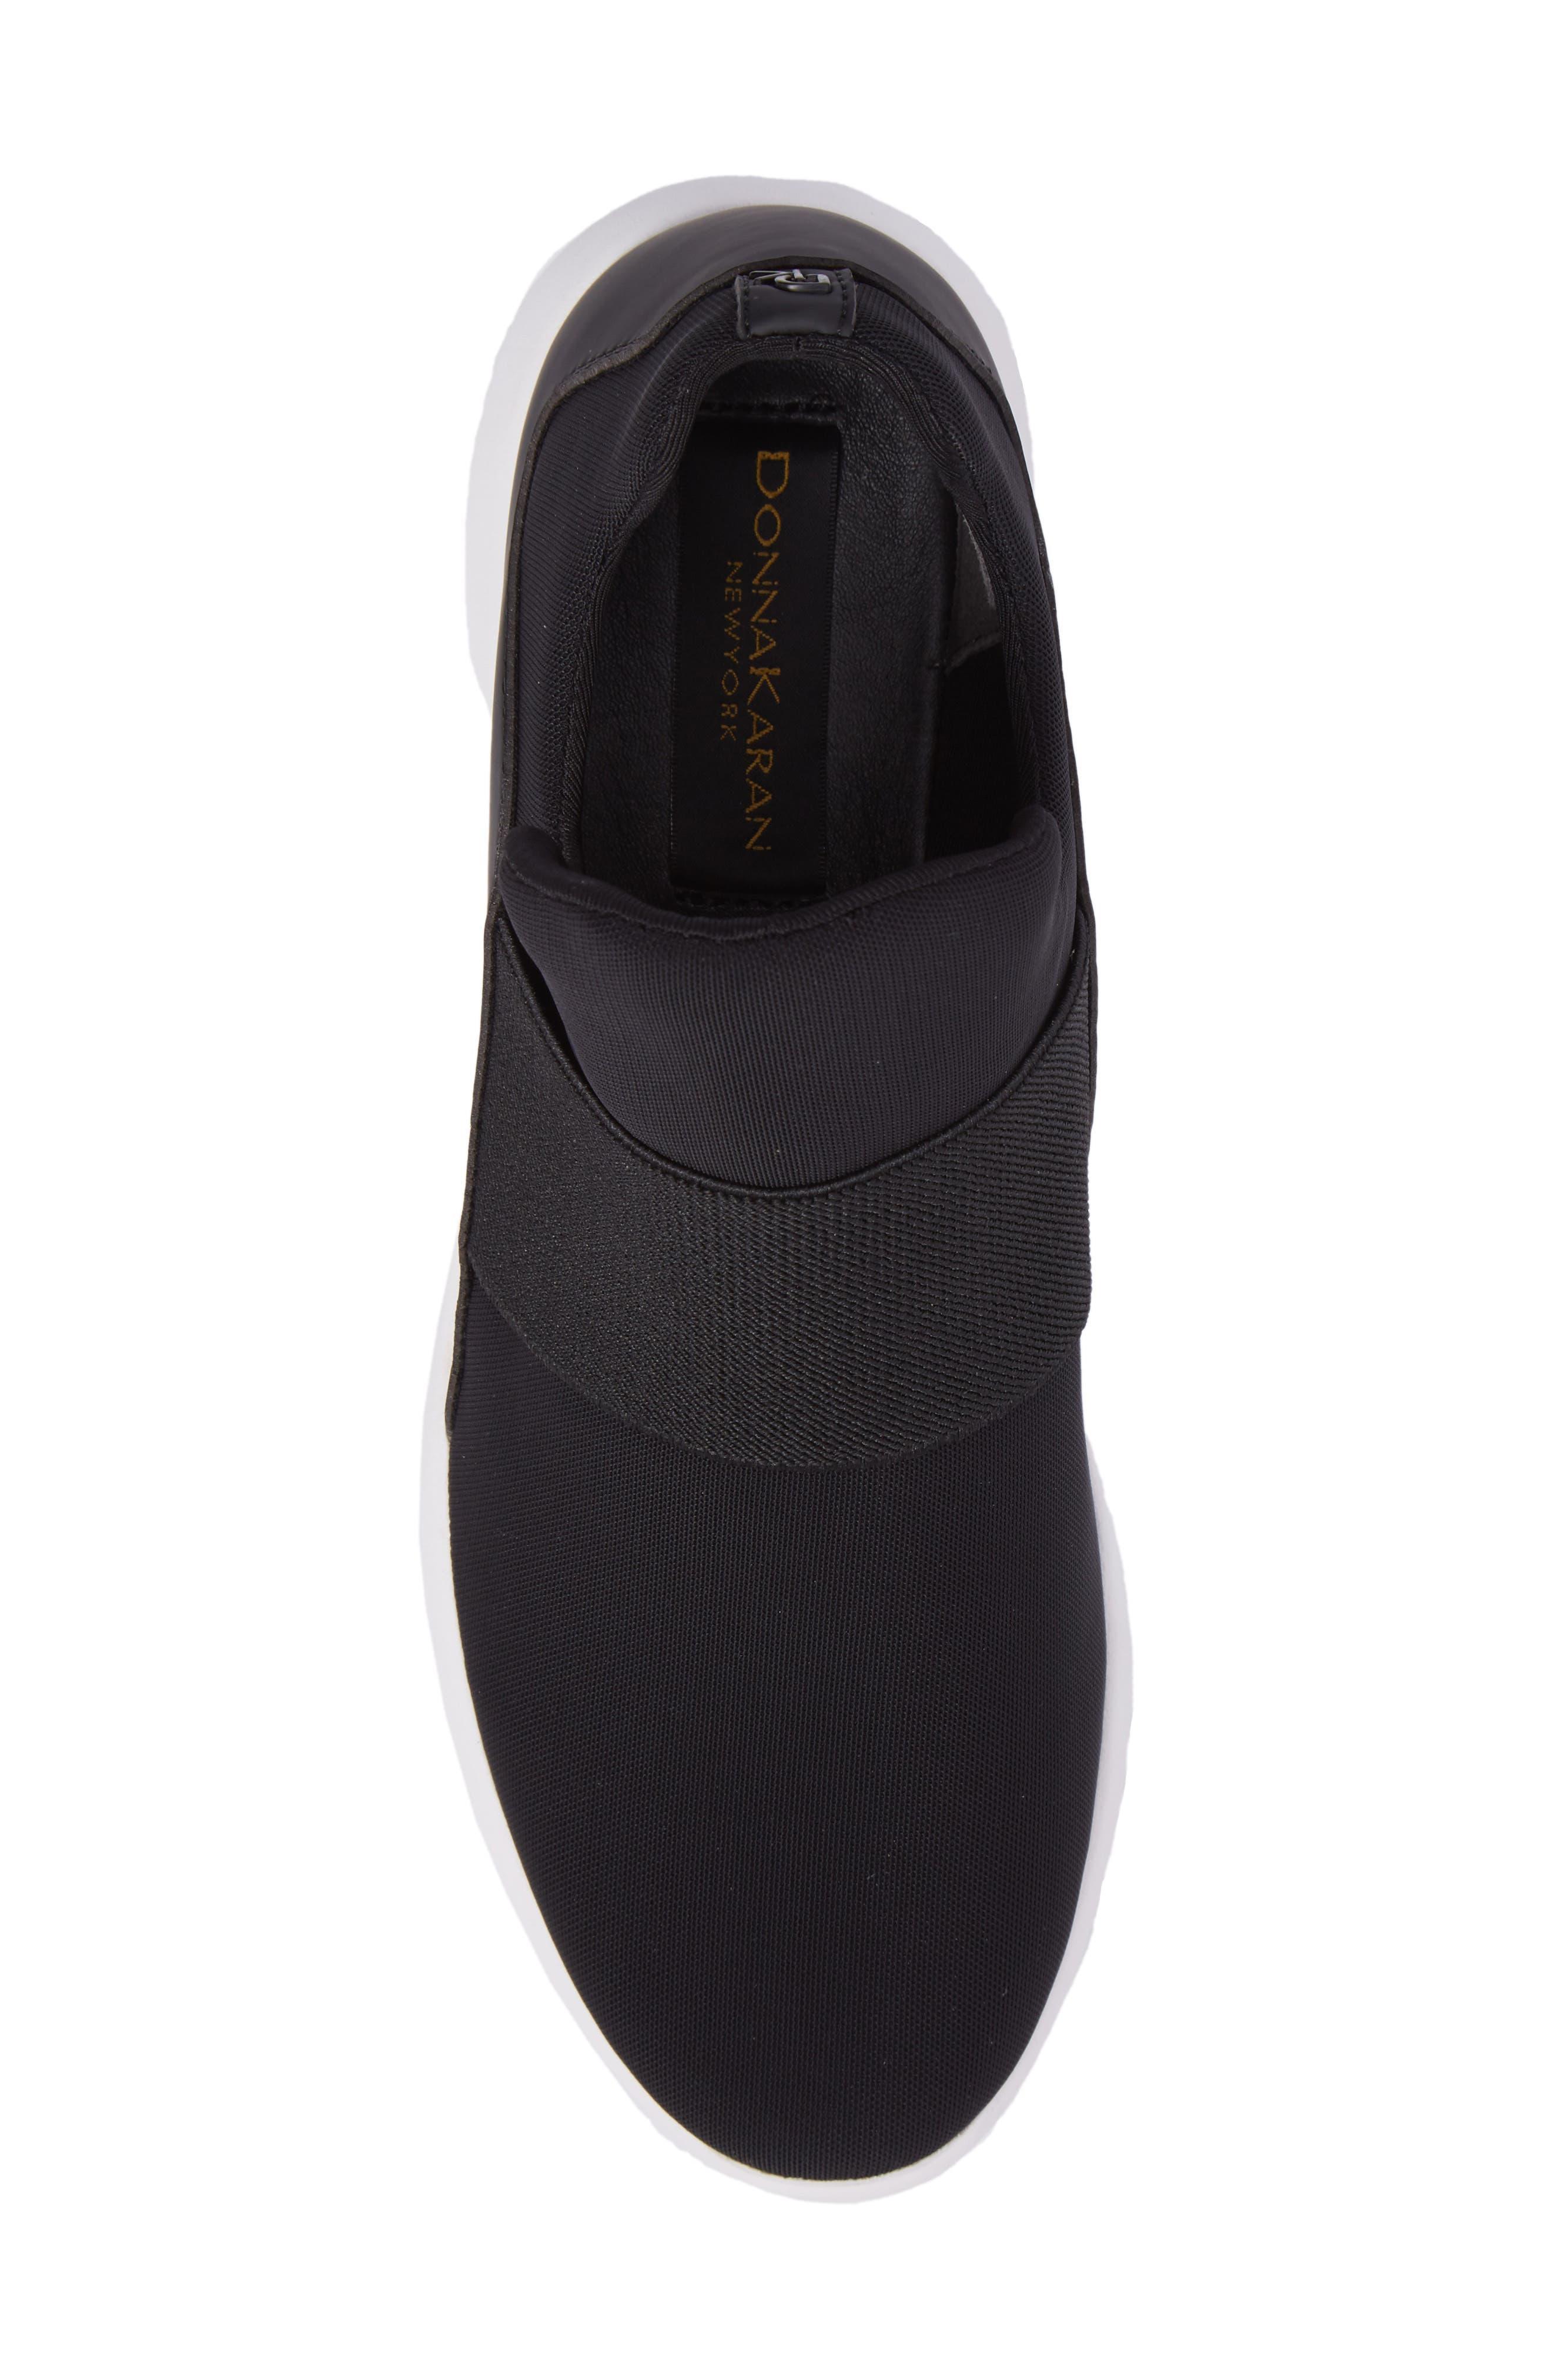 Donna Karan Cory Slip-On Sneaker,                             Alternate thumbnail 5, color,                             001